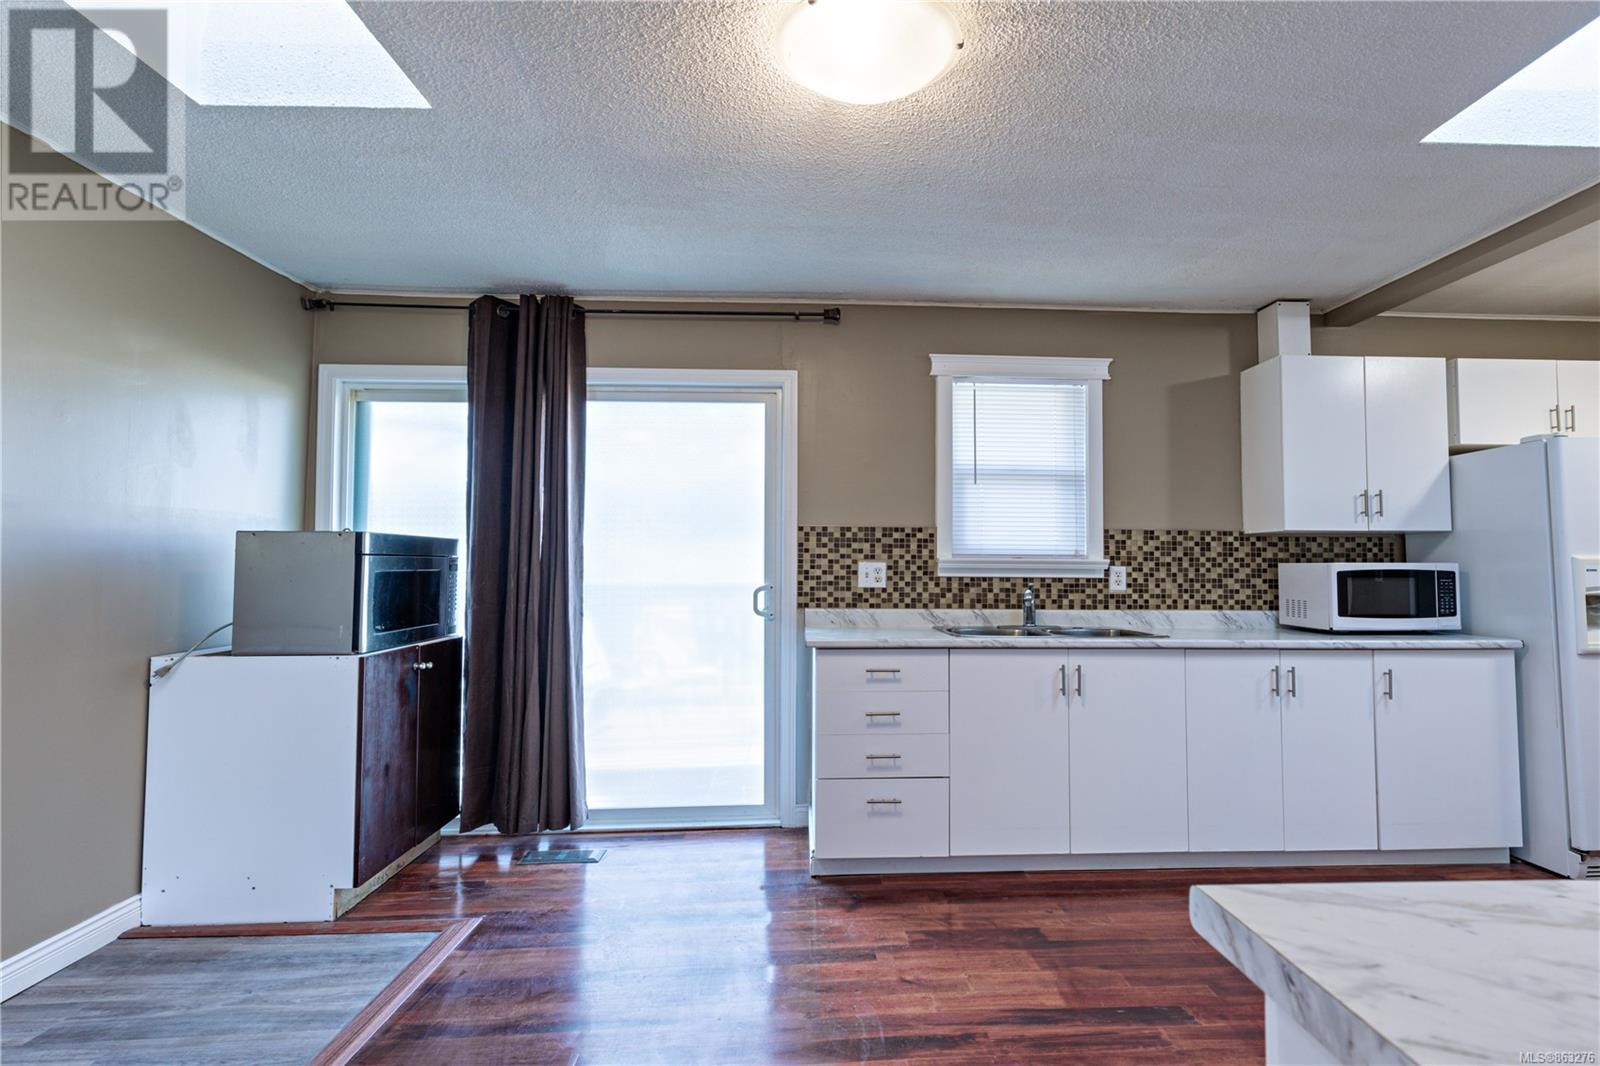 673 Winchester Ave, Nanaimo, British Columbia  V9R 4B6 - Photo 27 - 863276